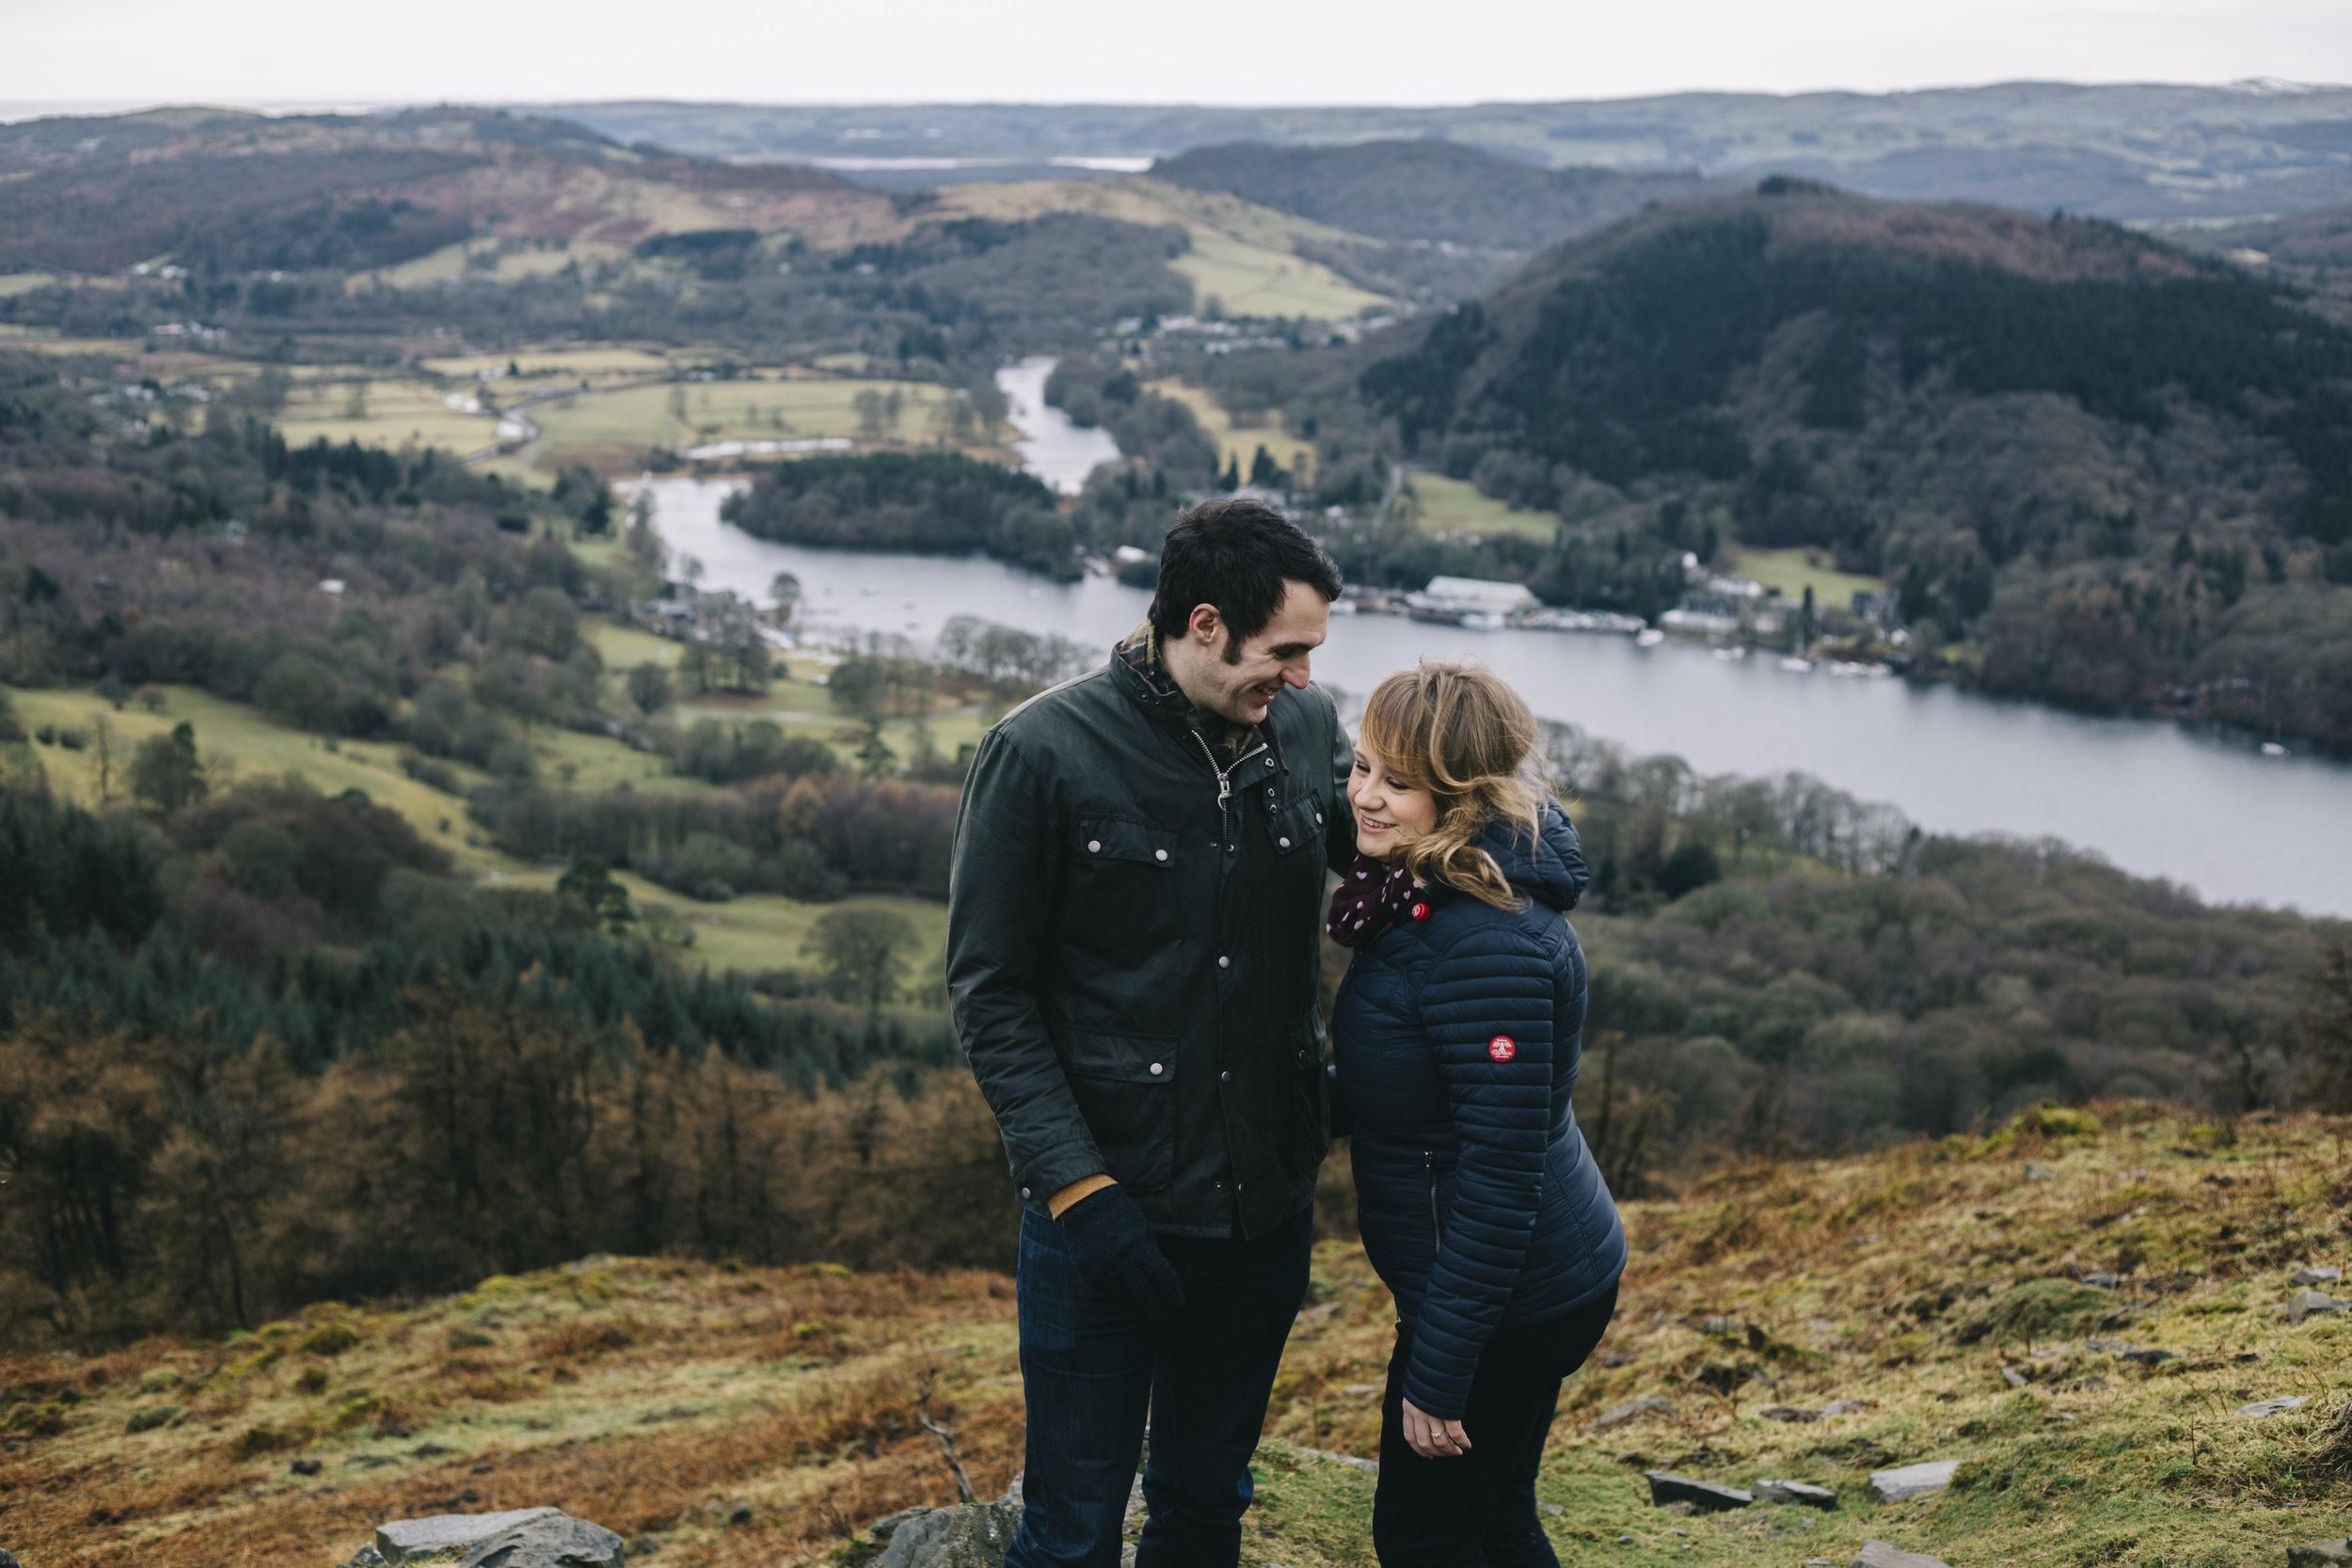 Alex + Matt - Windermere Engagement Photography - Claire Basiuk - 02.jpg